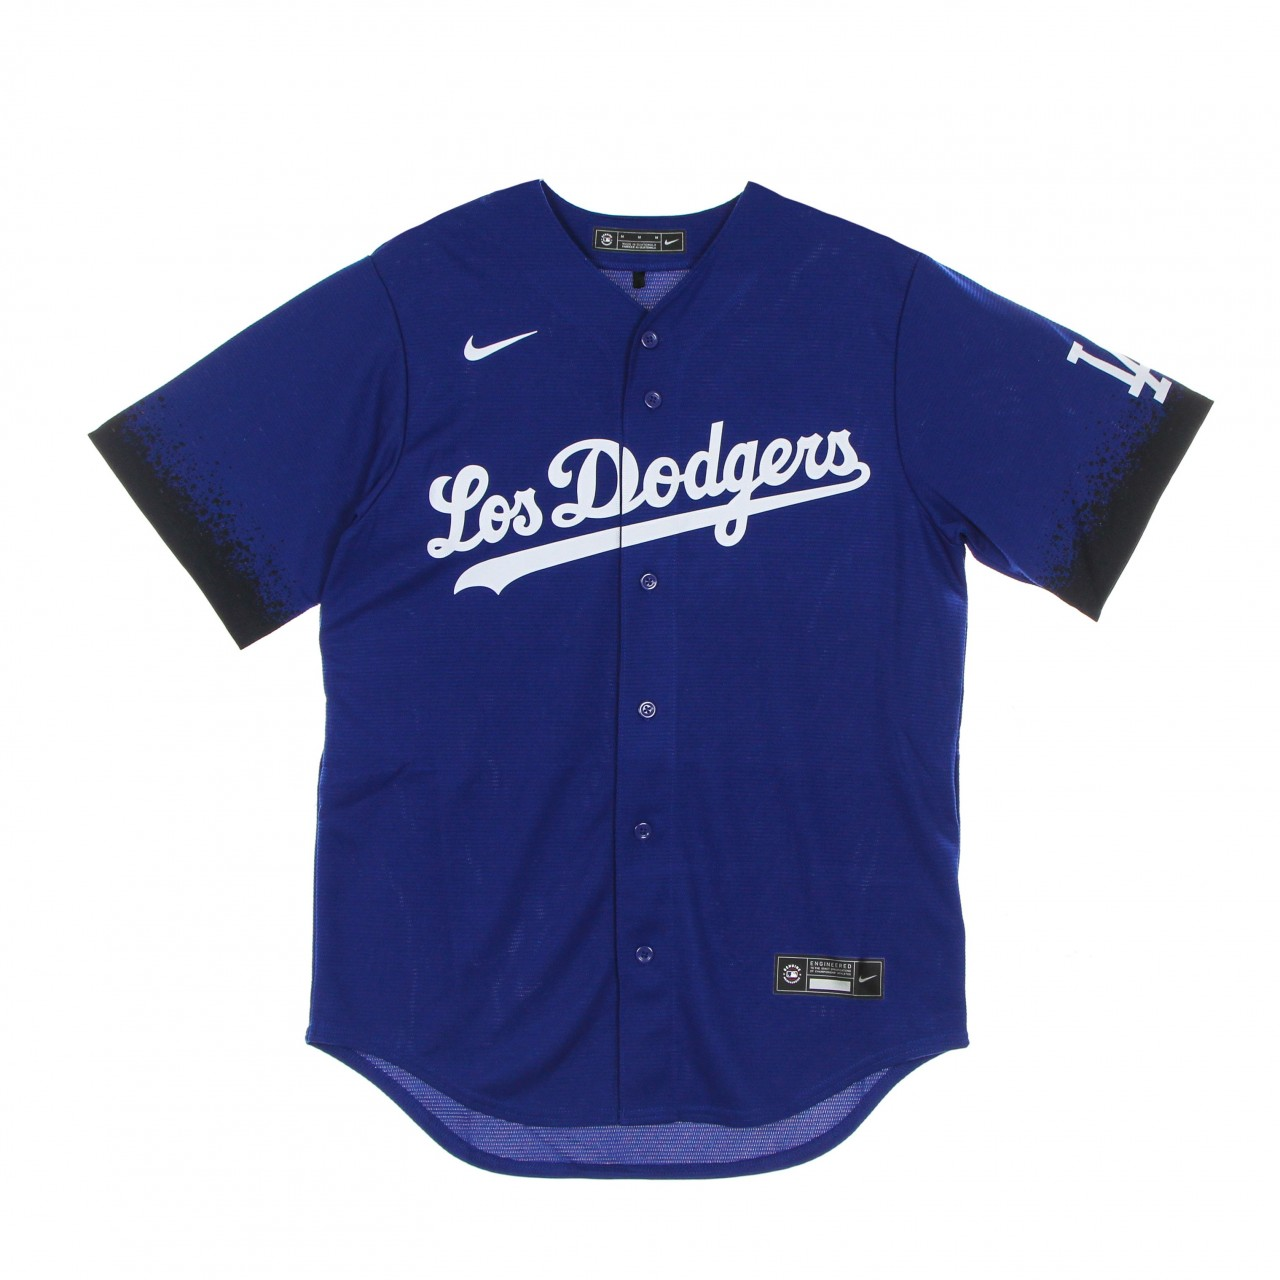 NIKE MLB MLB OFFICIAL REPLICA JERSEY CITY CONNECT LOSDOD T770-LDCC-LD-KMG